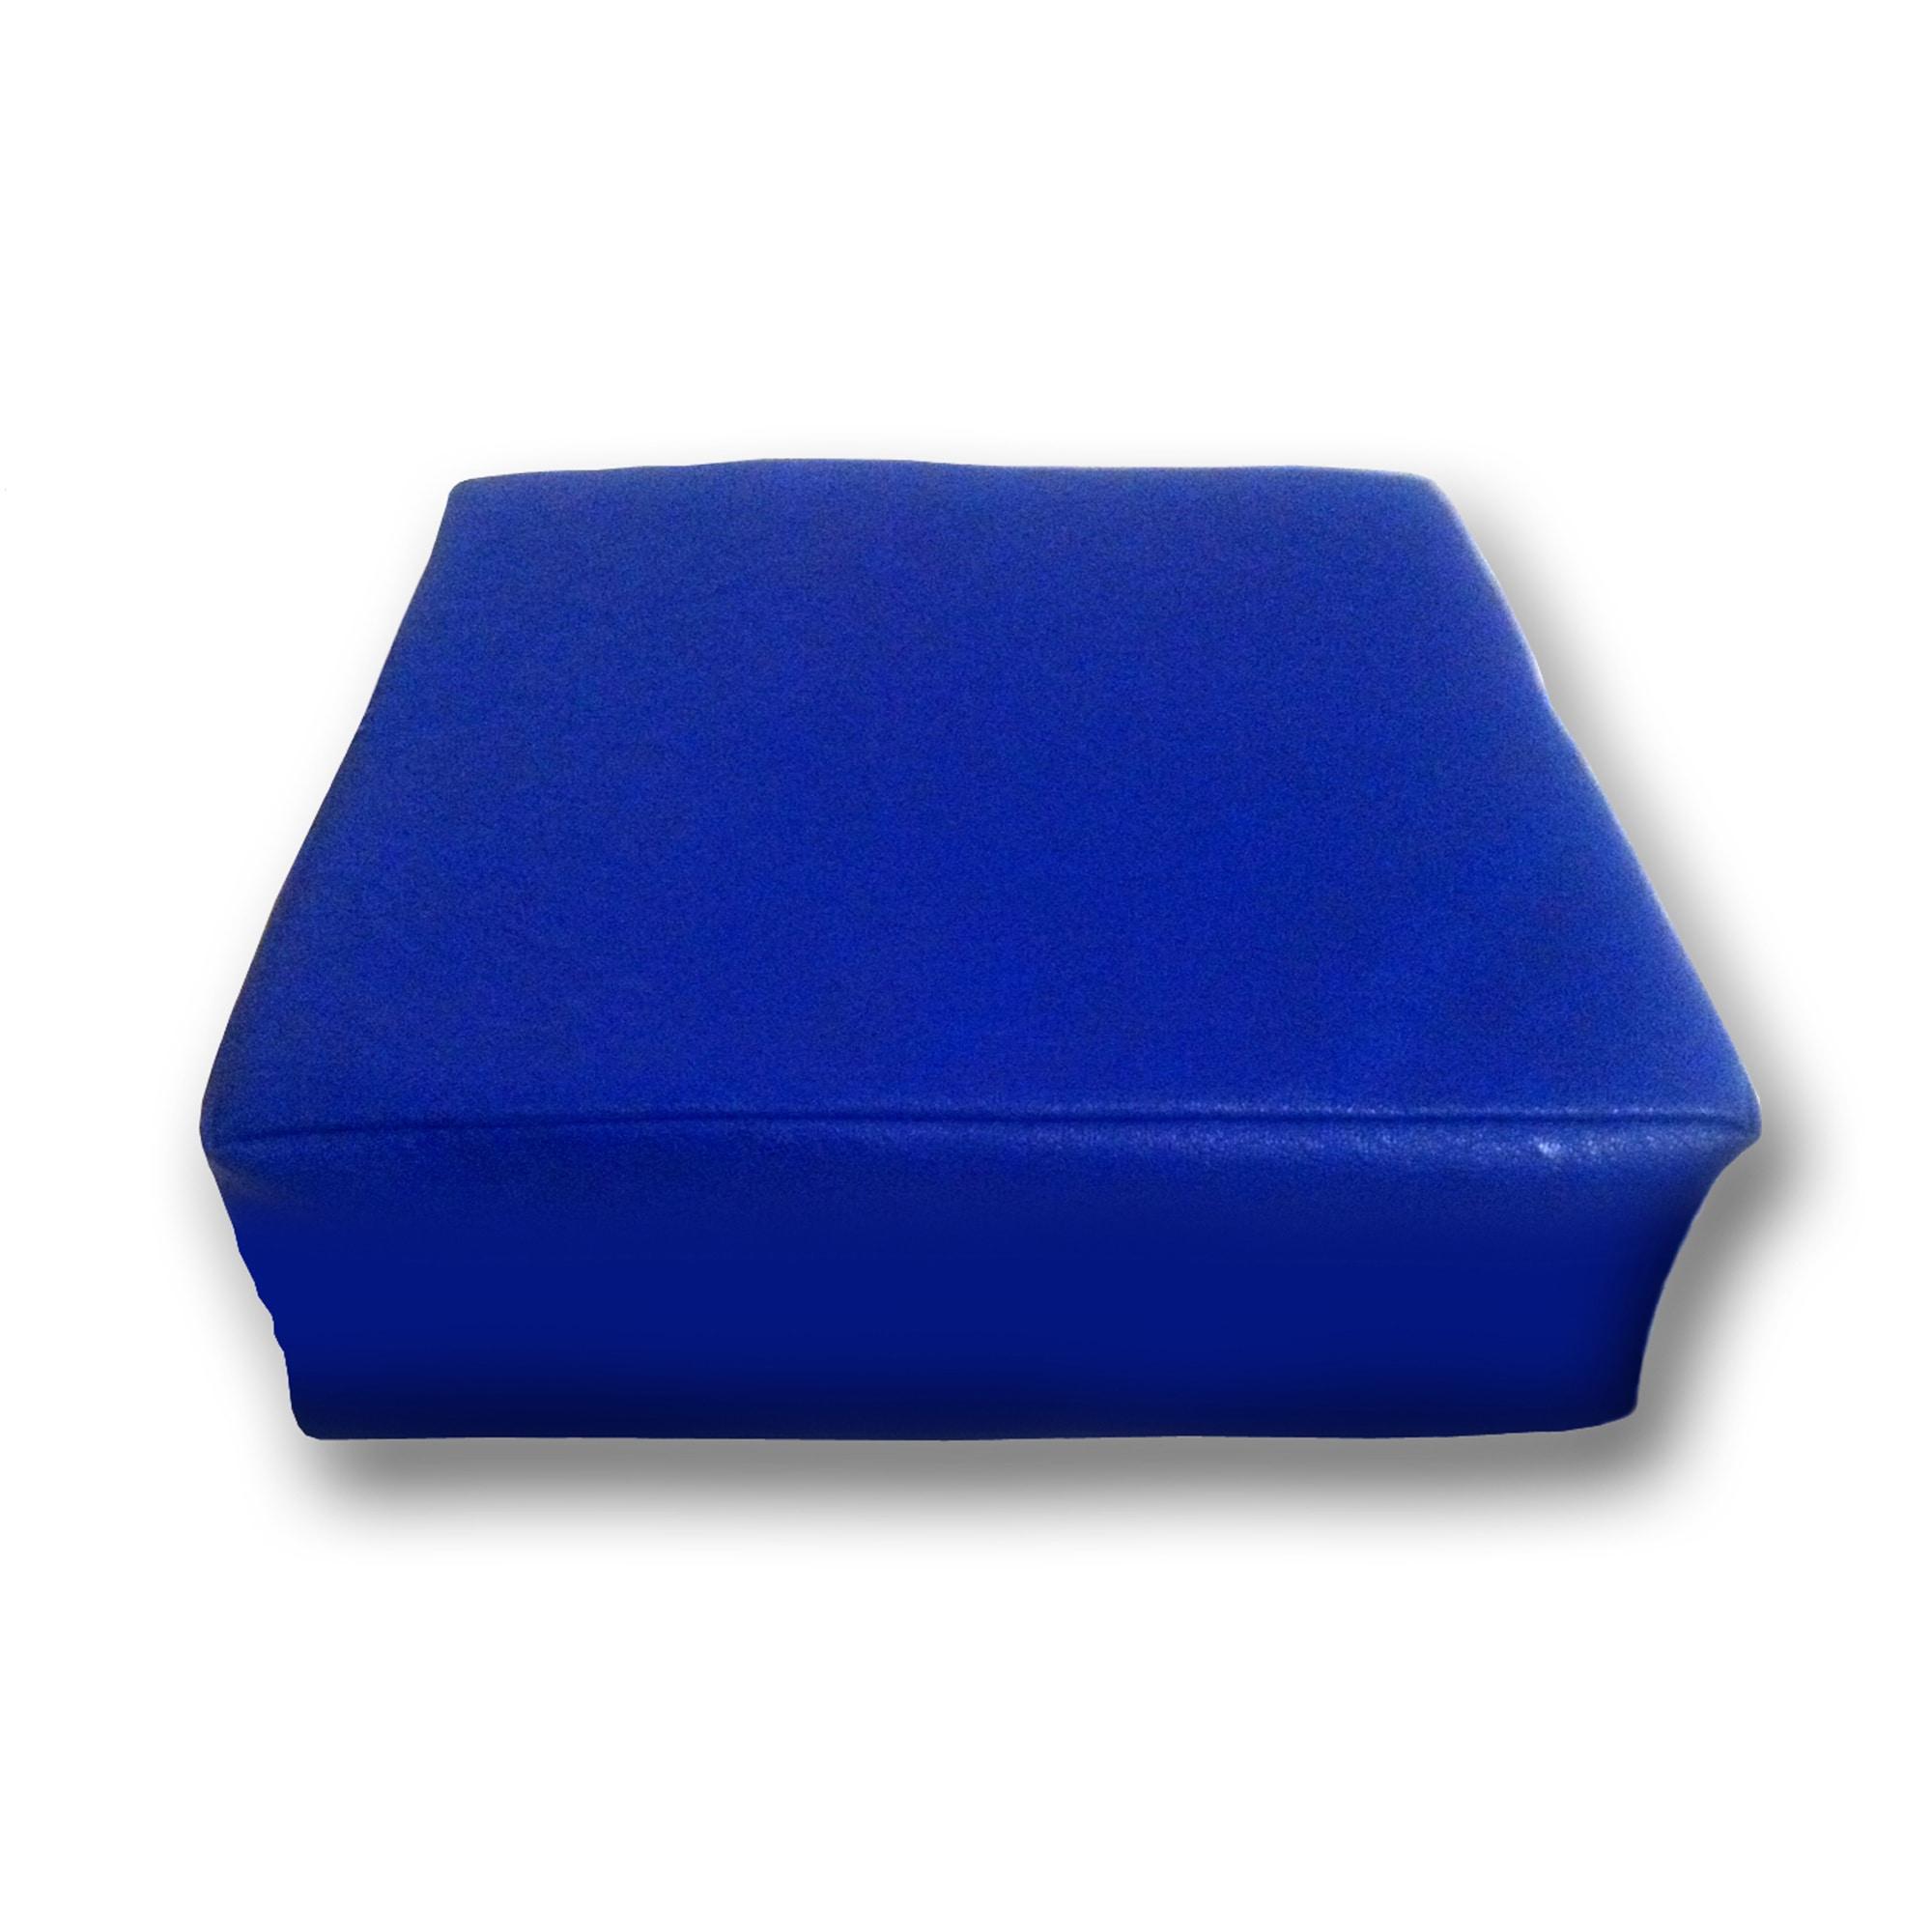 Vital Baby Senseez Blue Square Vibrating Pillow